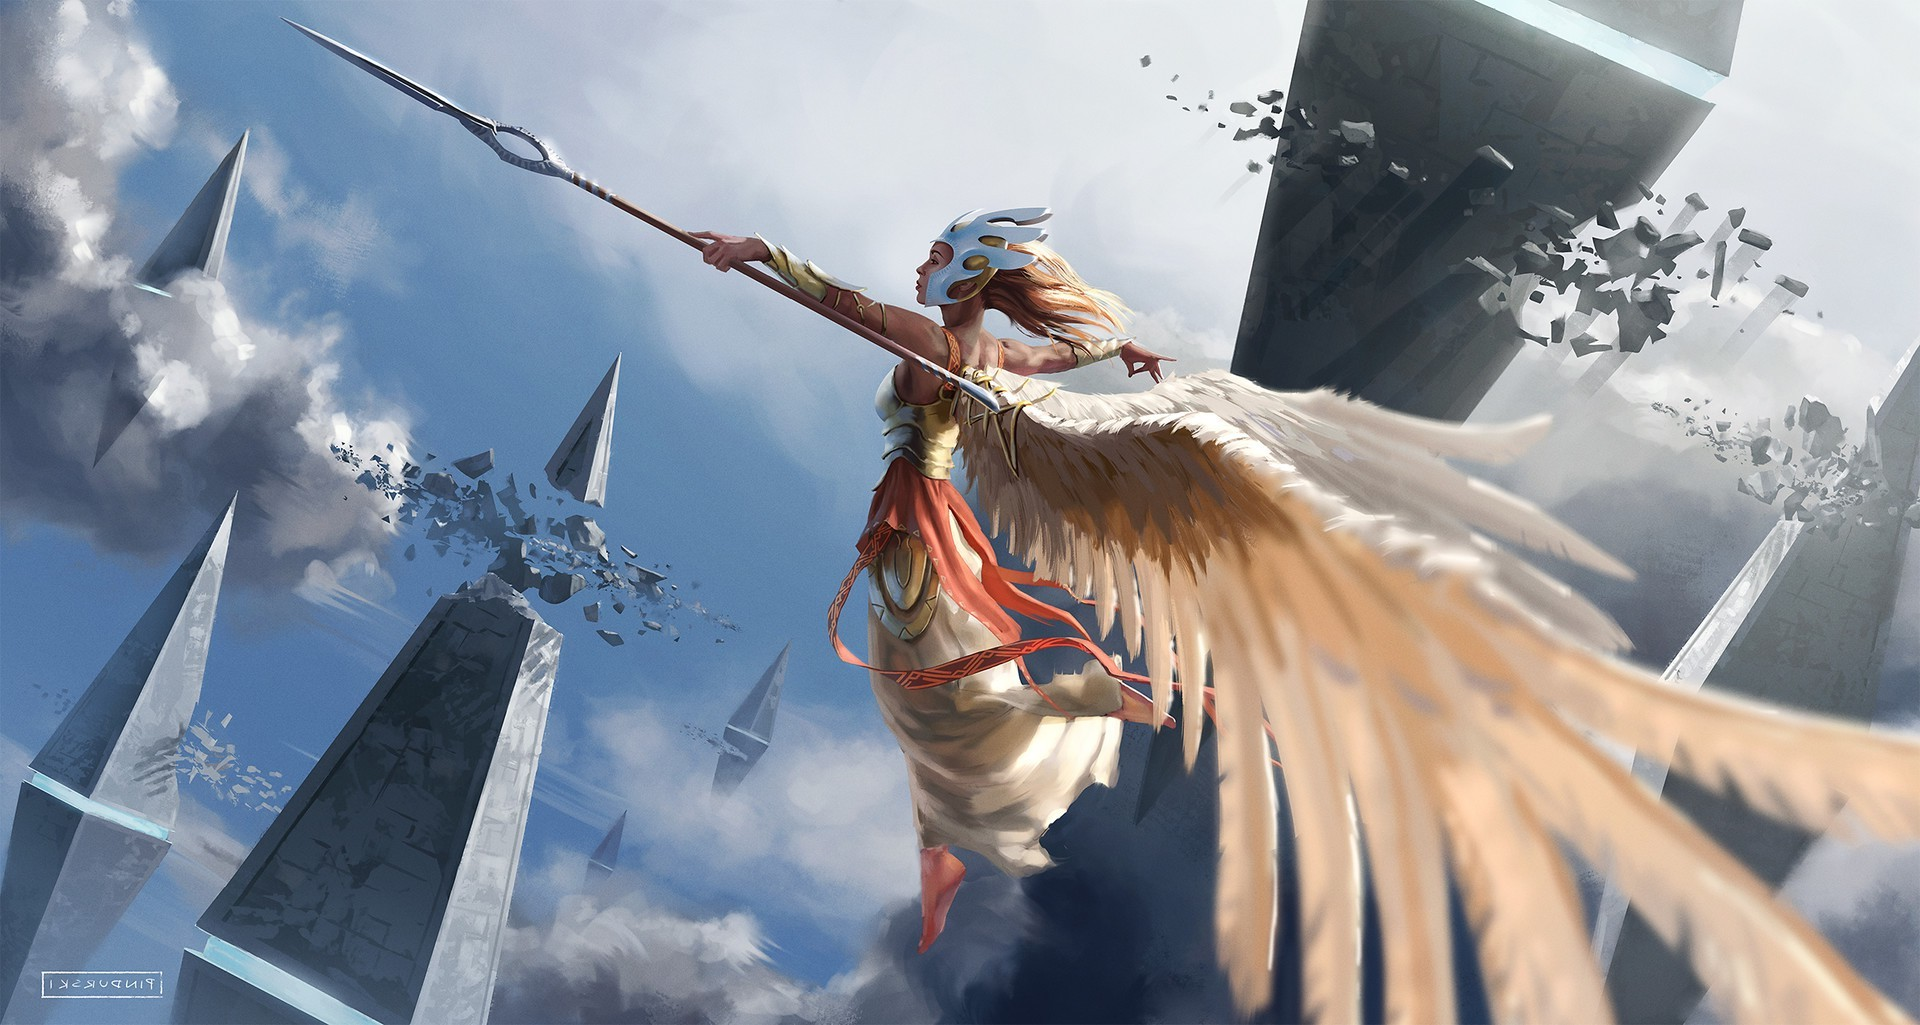 3d Dragon Wallpapers For Desktop Fantasy Art Spear Wings Flying Clouds Wallpapers Hd